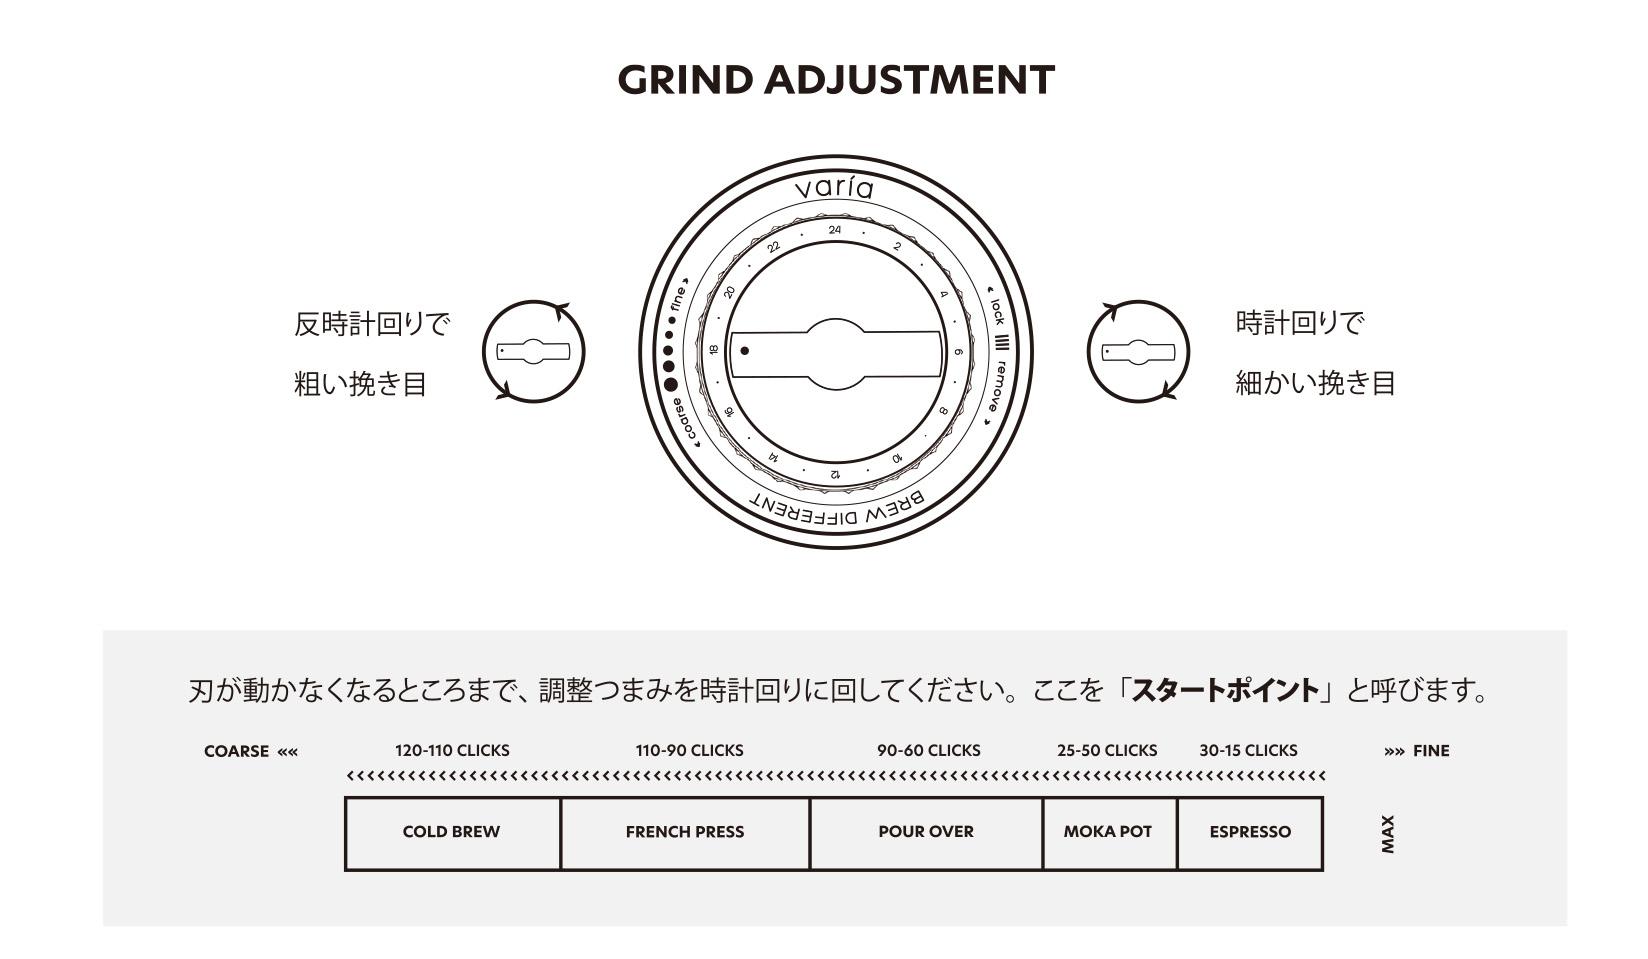 Varia Hand Grinder / ヴァリア コーヒーミル 説明書